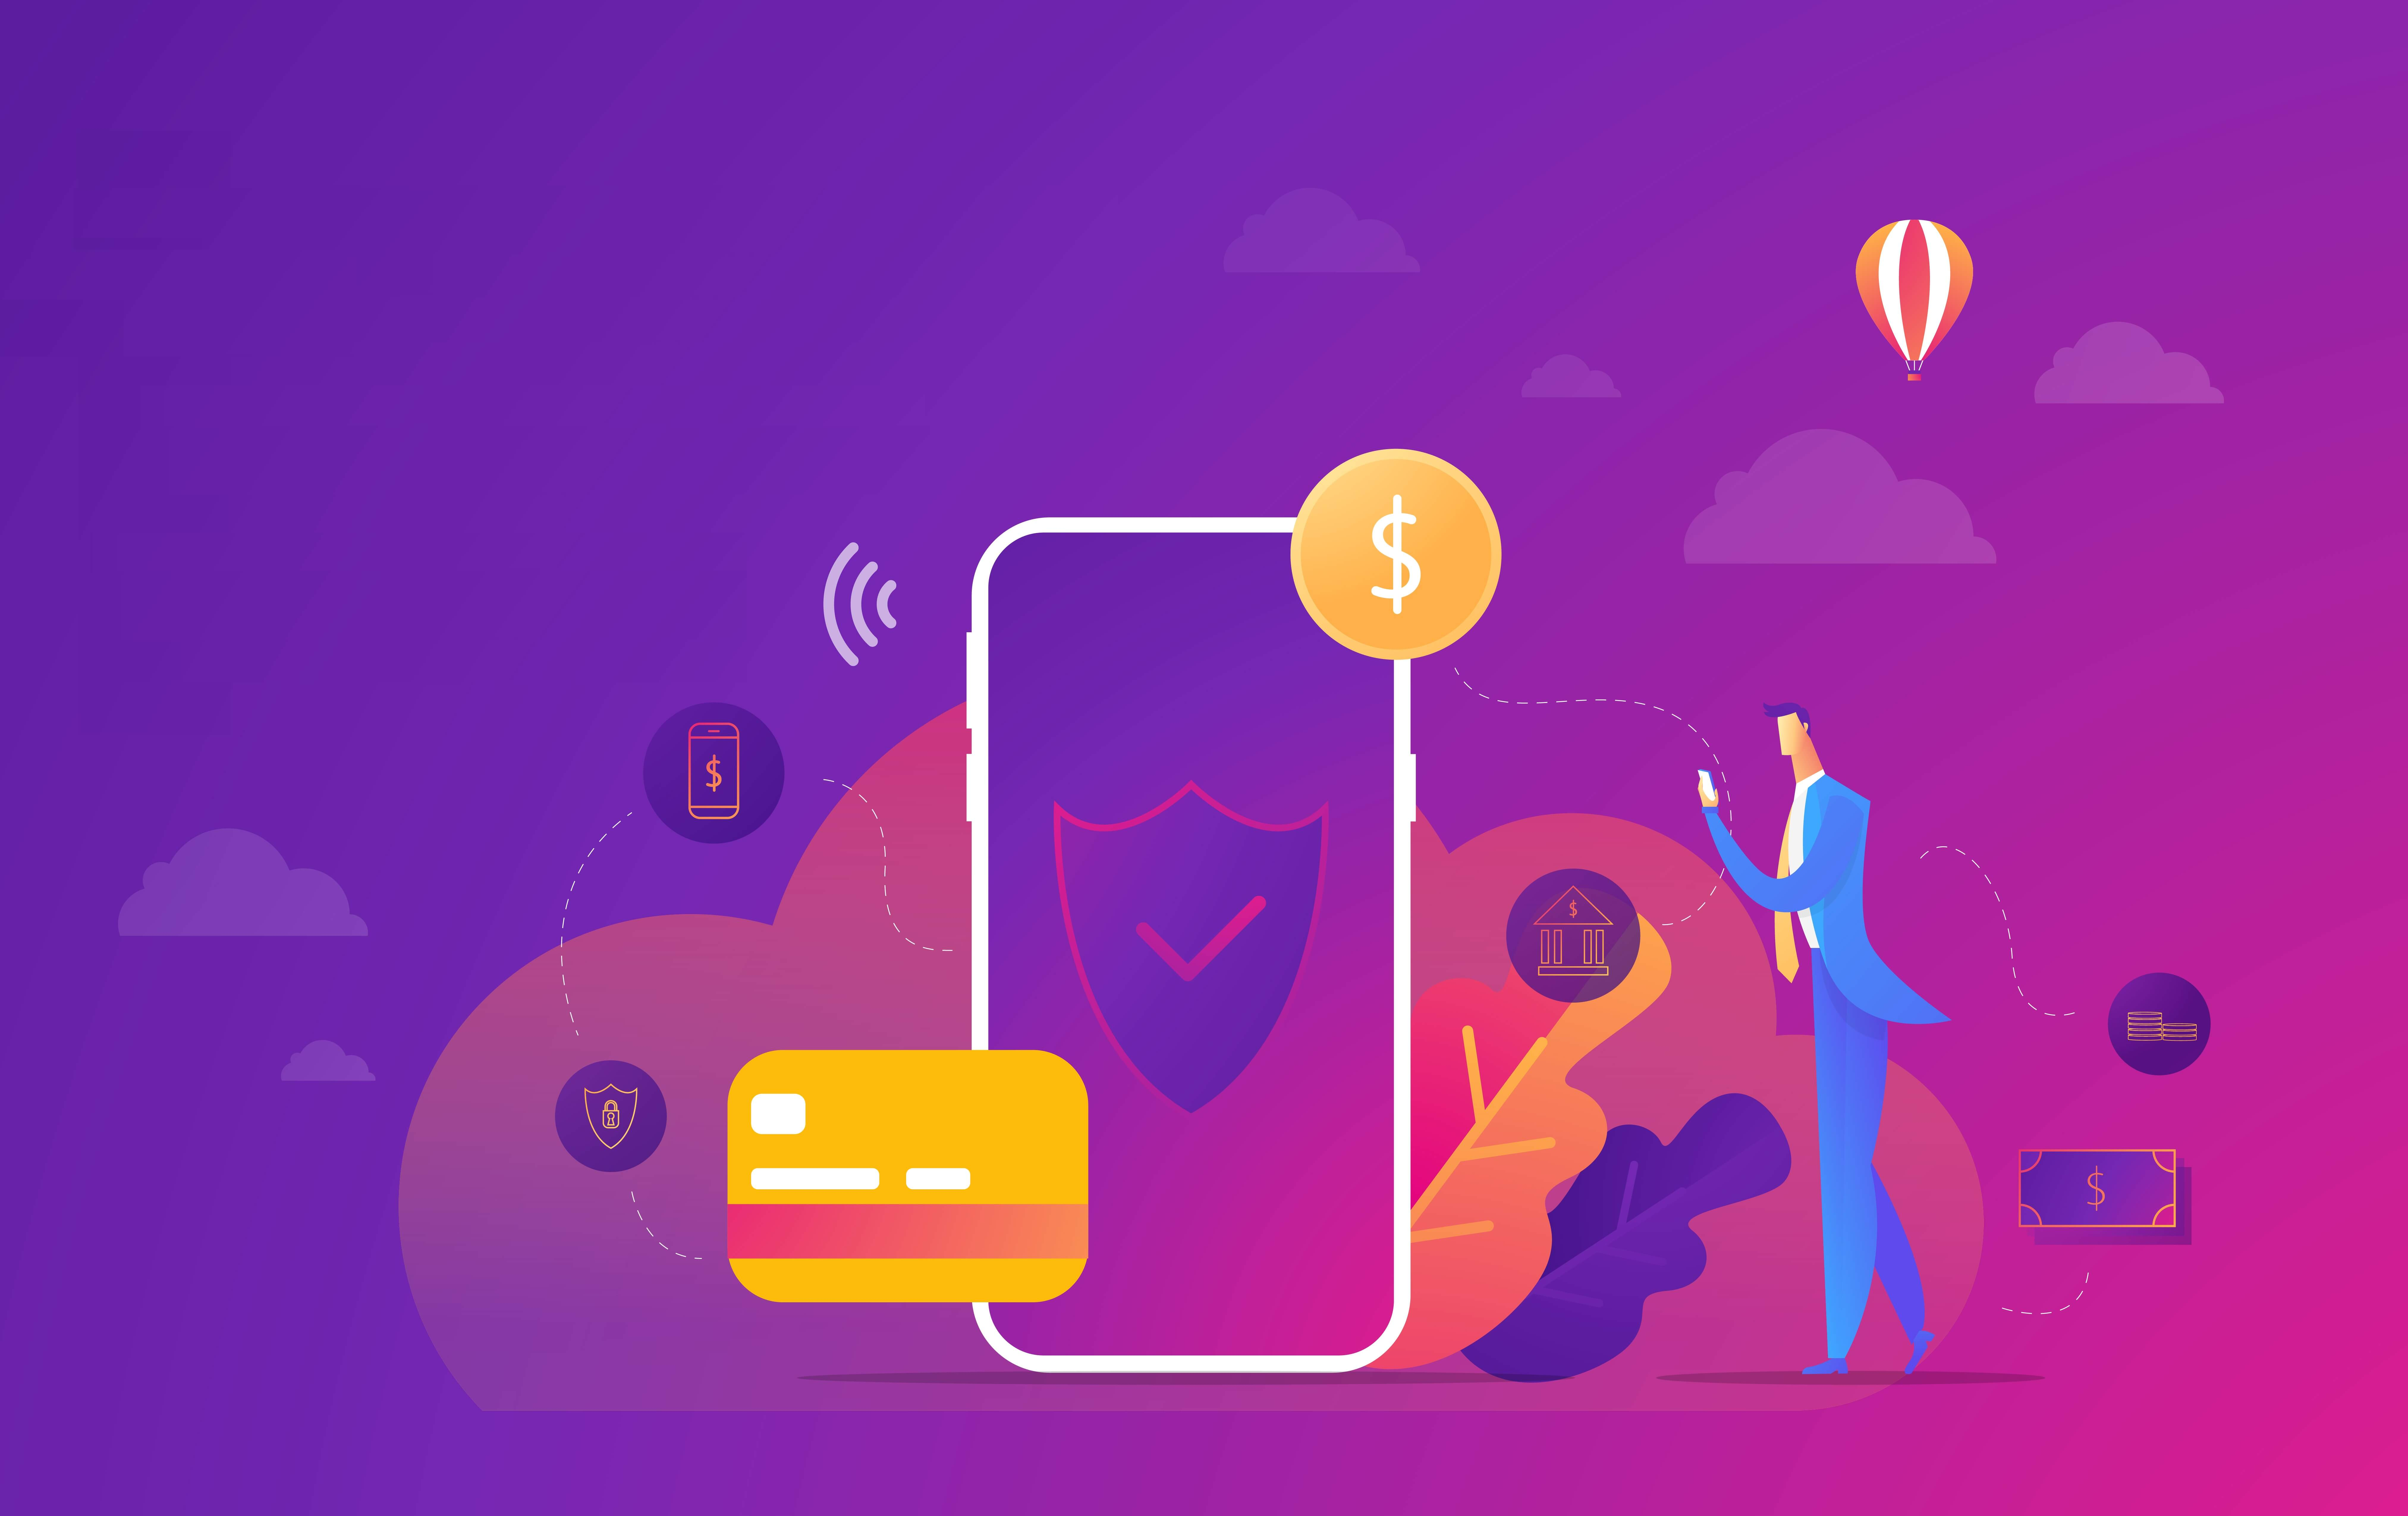 How to Login and Deposit Money in Binomo